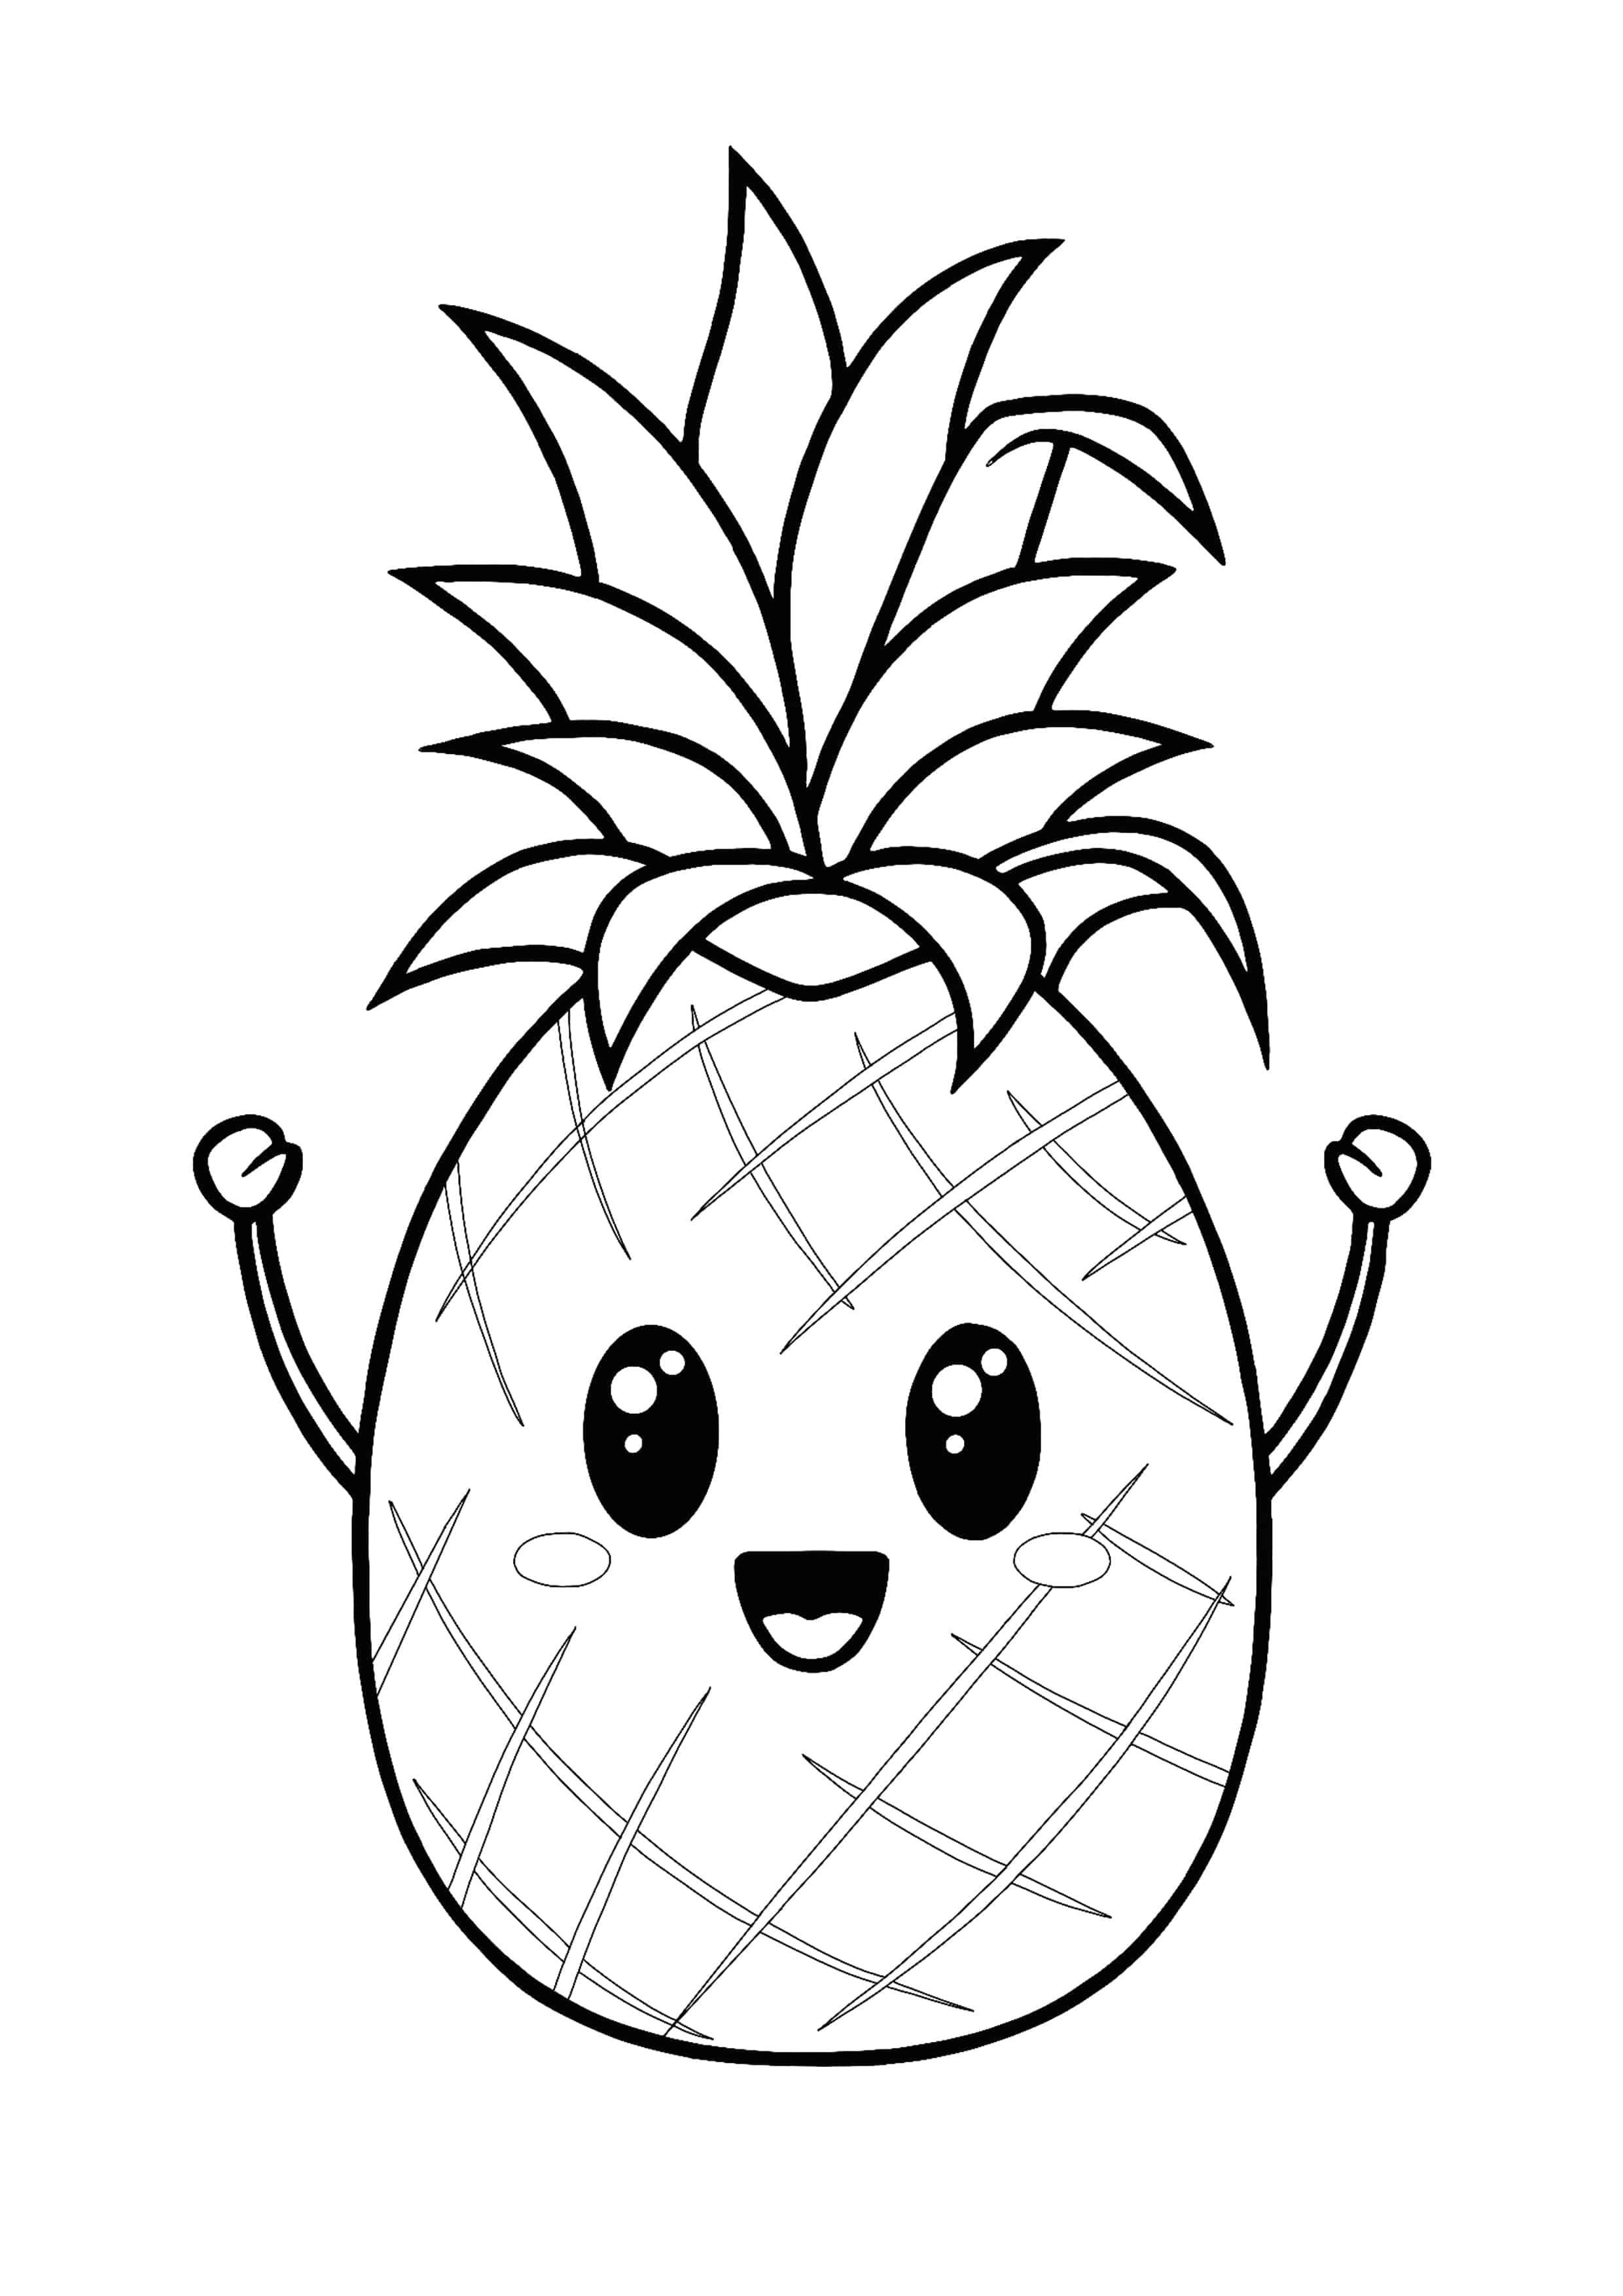 Cute Kawaii Cute Coloring Pages : kawaii, coloring, pages, Kawaii, Pineapple, Coloring, Pineapple,, Pages,, Printable